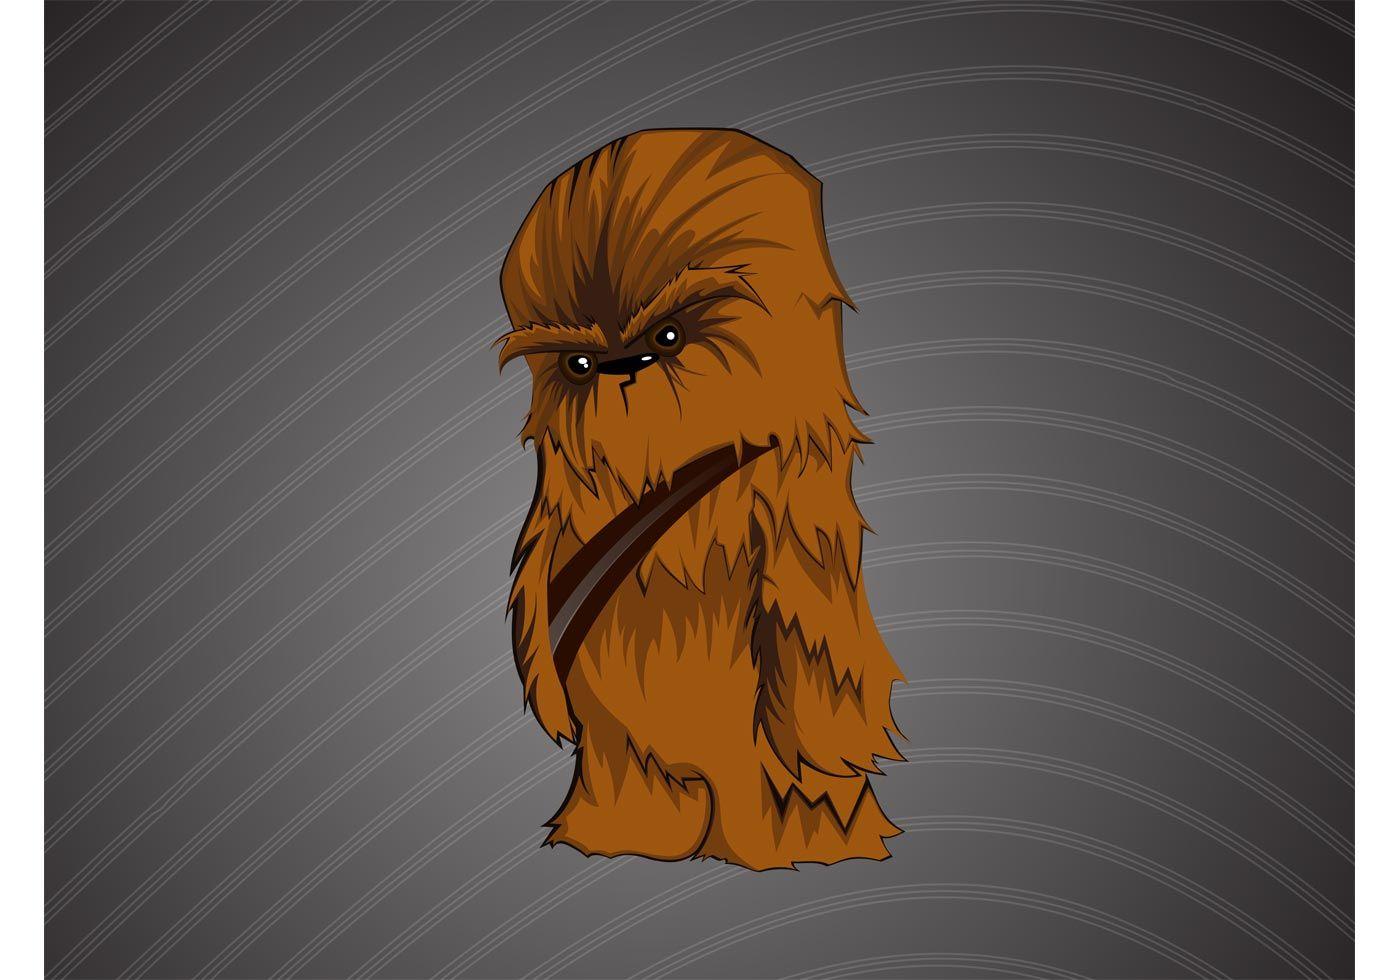 Cute and stylish Chewbacca vector cartoon of Star Wars fan favorite ...